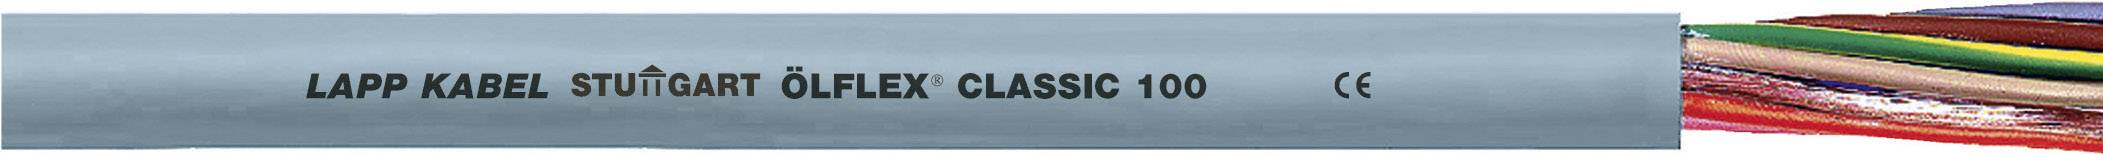 Kabel LappKabel Ölflex CLASSIC 100 5X0,75 (00101274), PVC, 6,7 mm, 500 V, šedá, 500 m